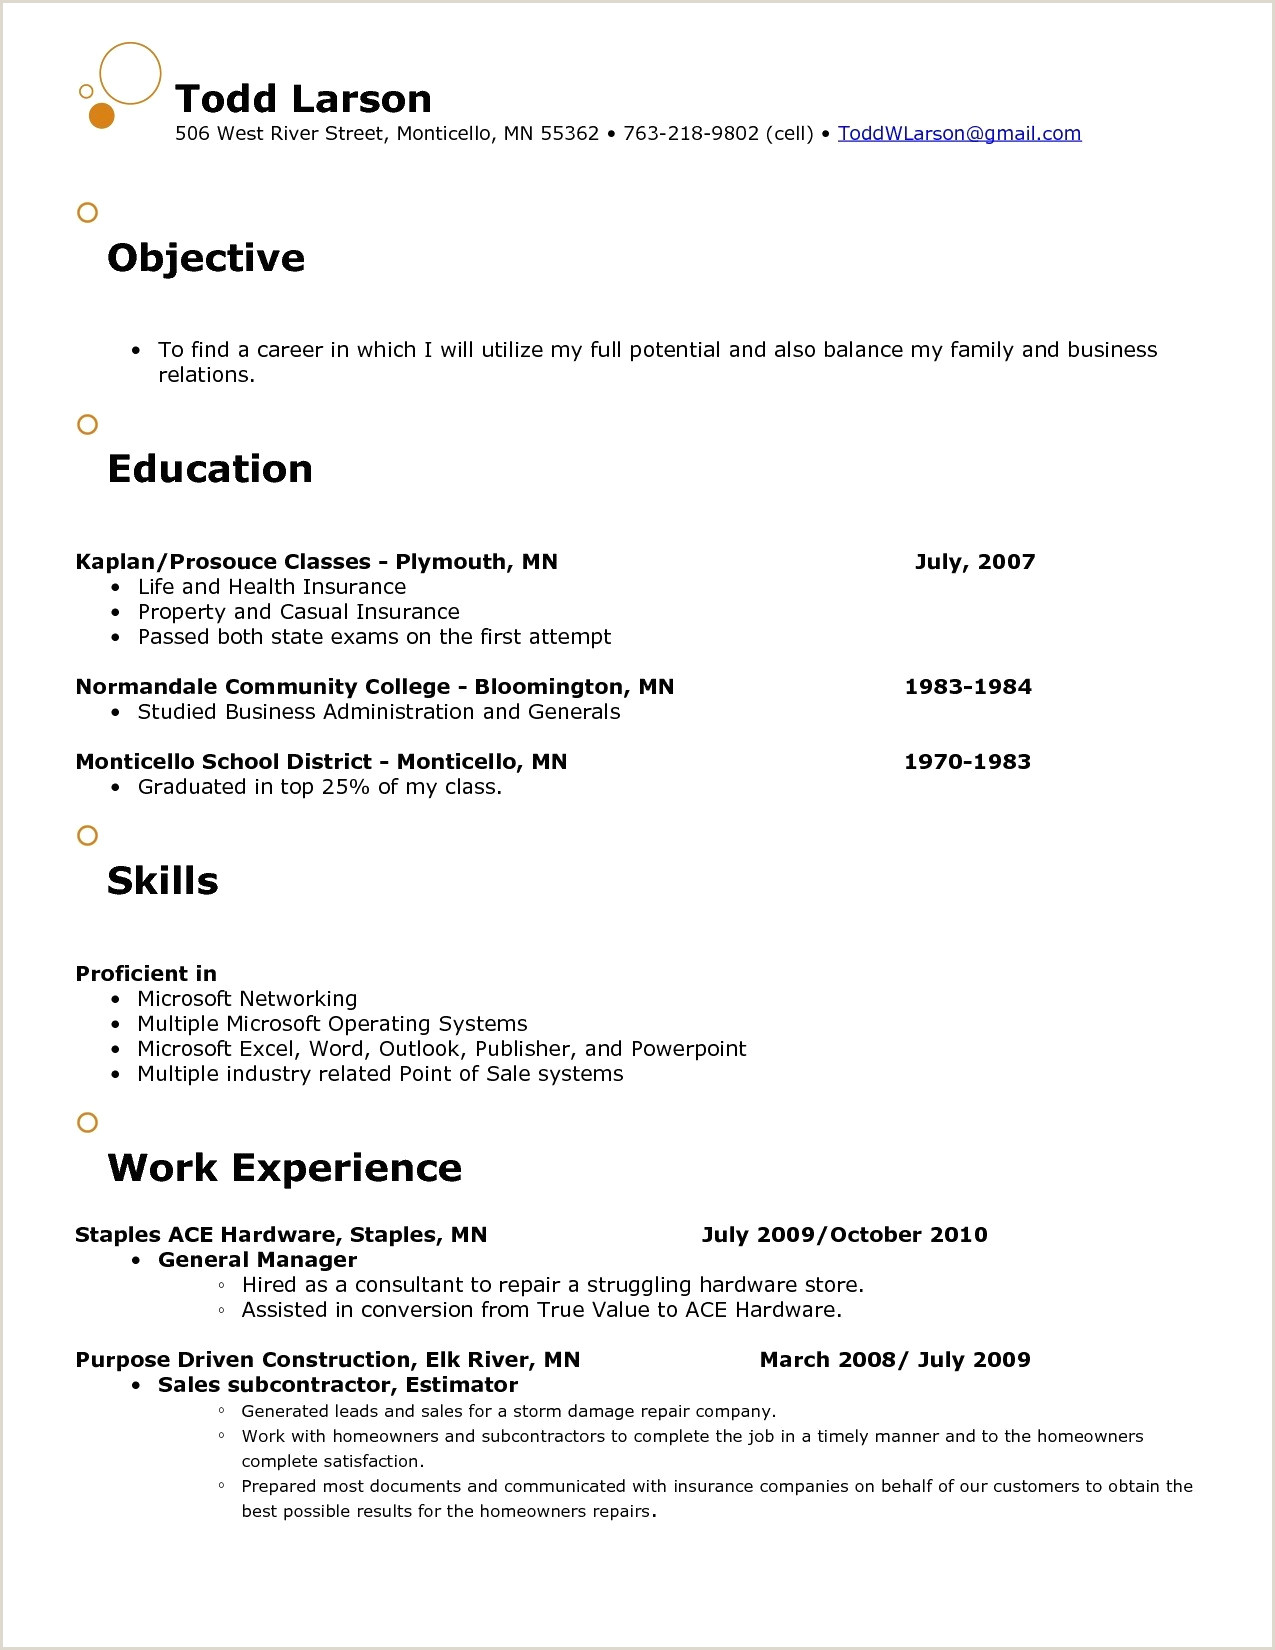 Resume top Model Unique Additional Skills A Resume Best Cna